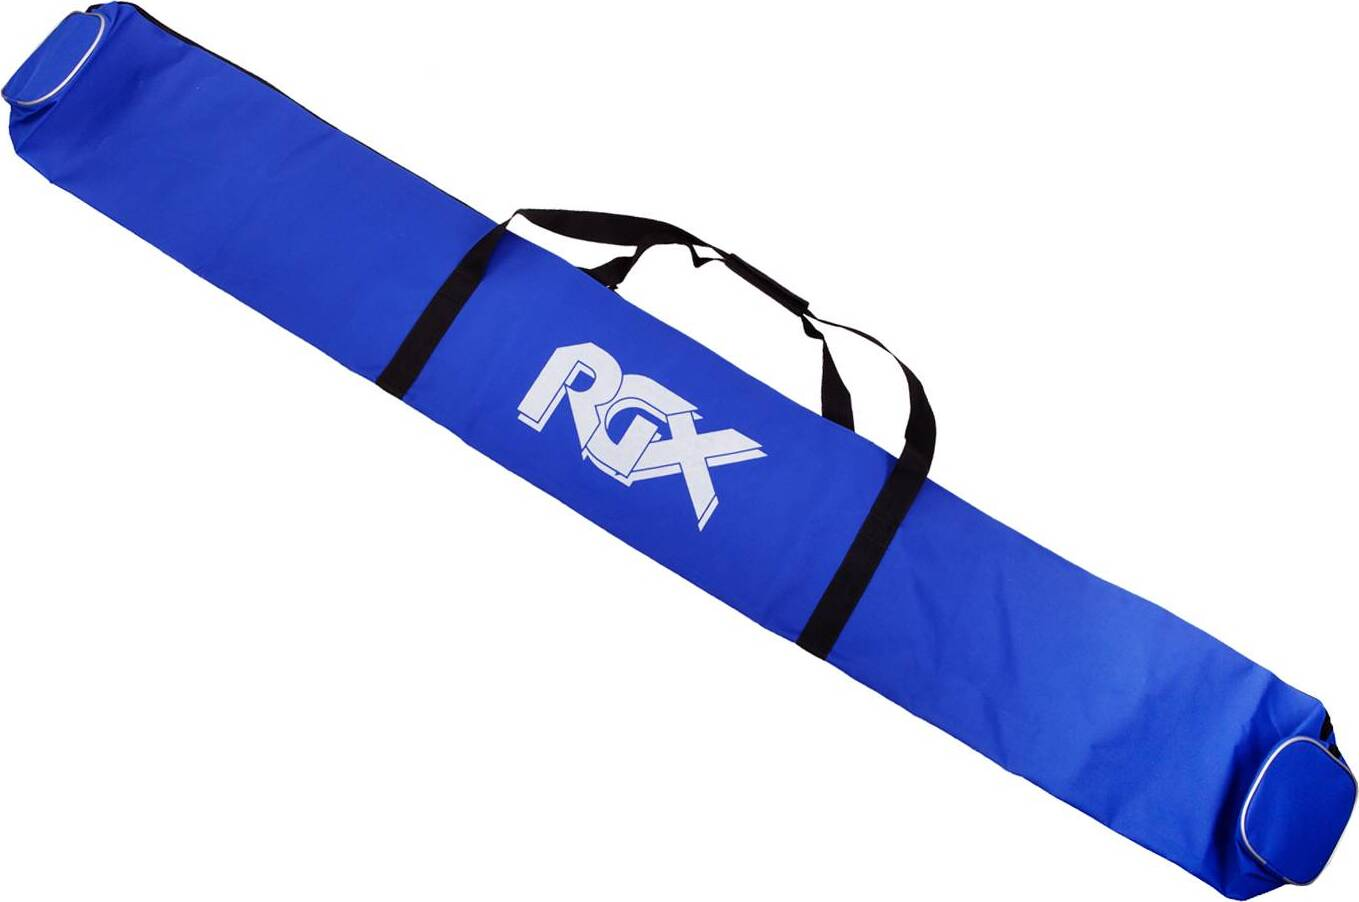 Чехол для двух пар лыж с палками RGX SB-003 синий 185 см.